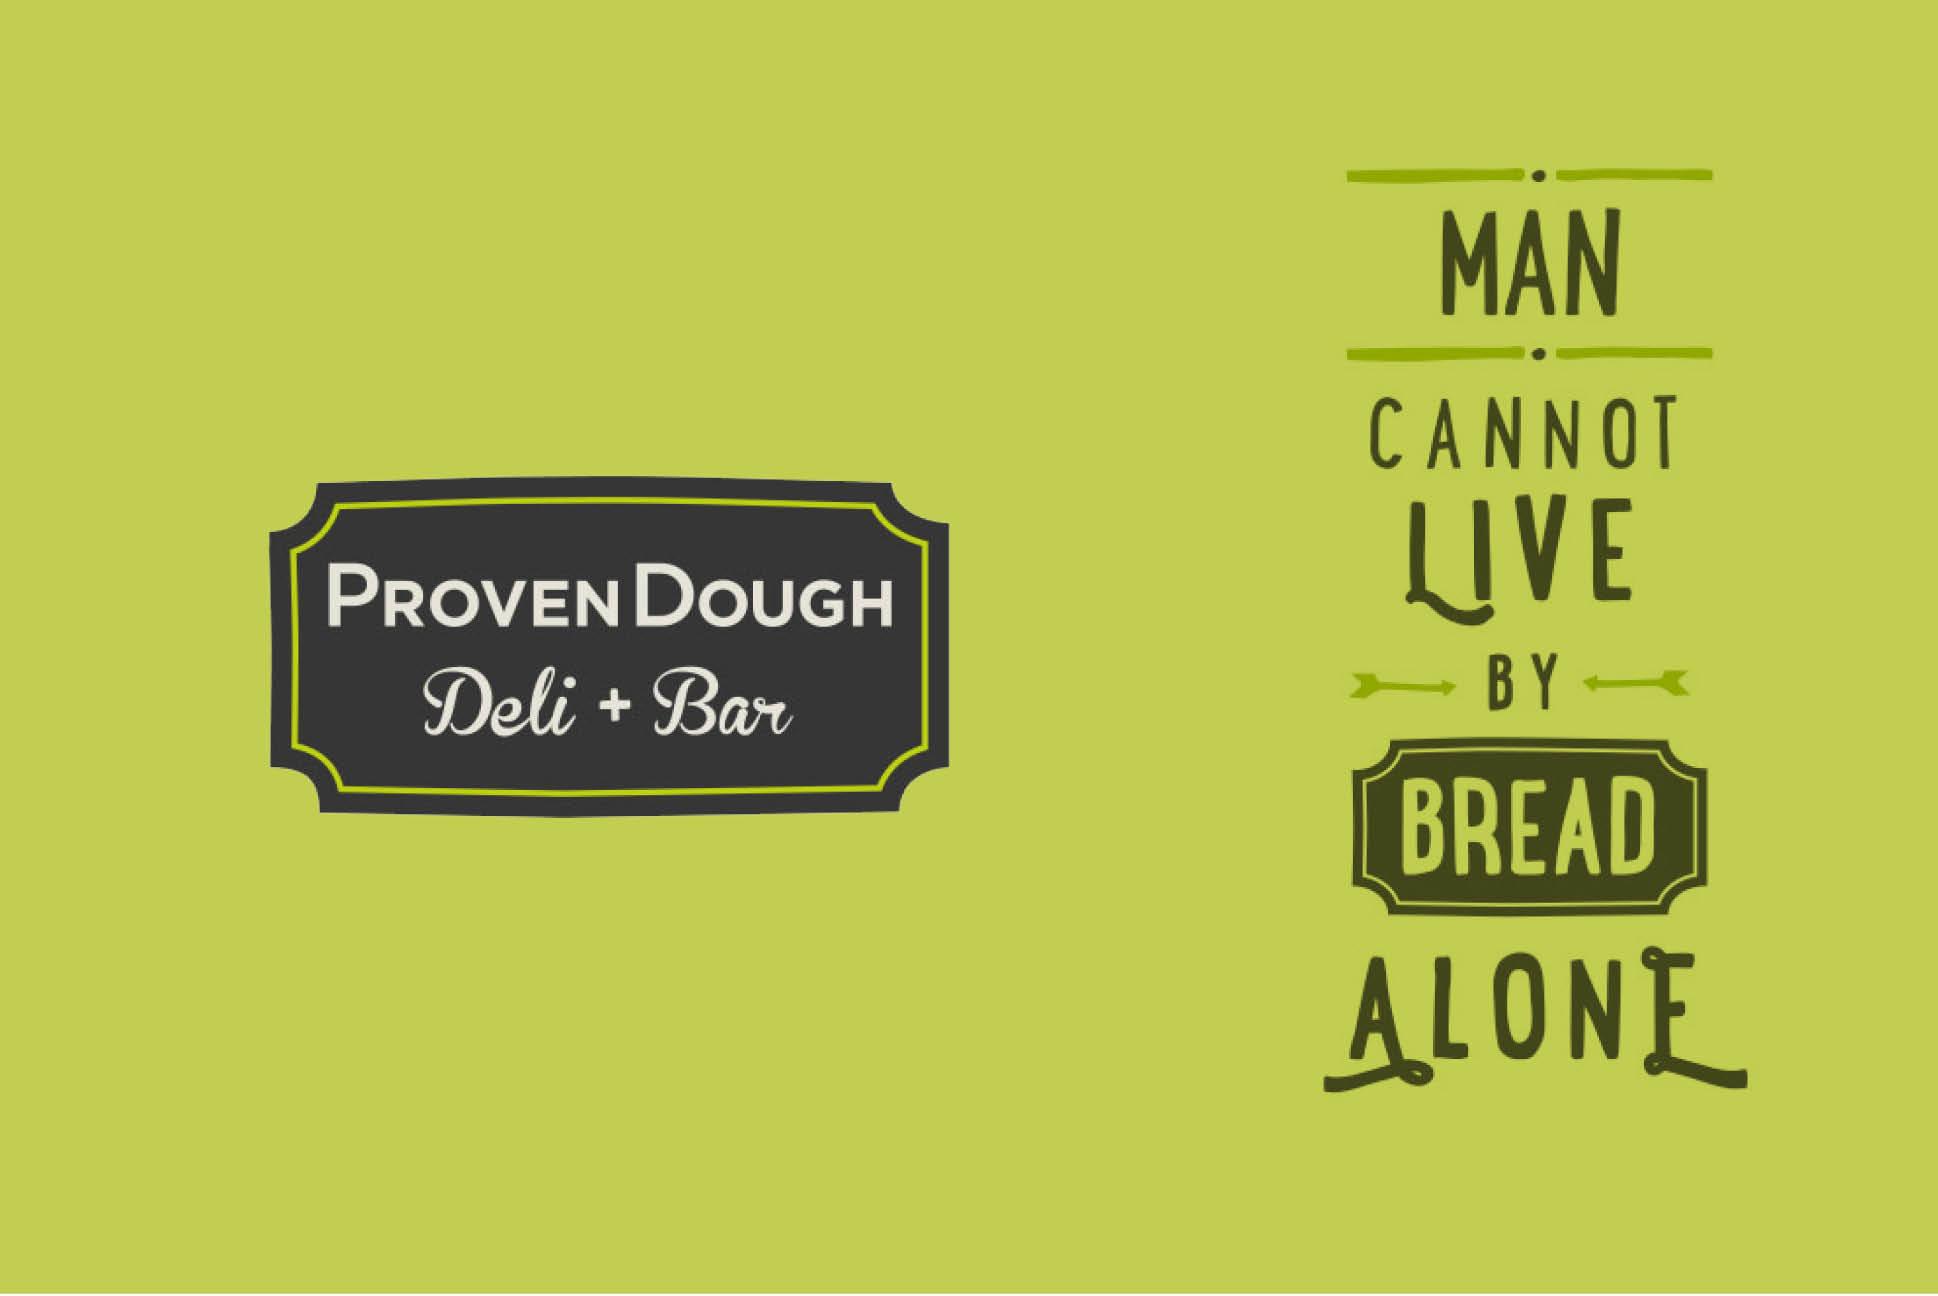 ProvenDough branding | Branding and Identity Design - Independent Marketing | IM London